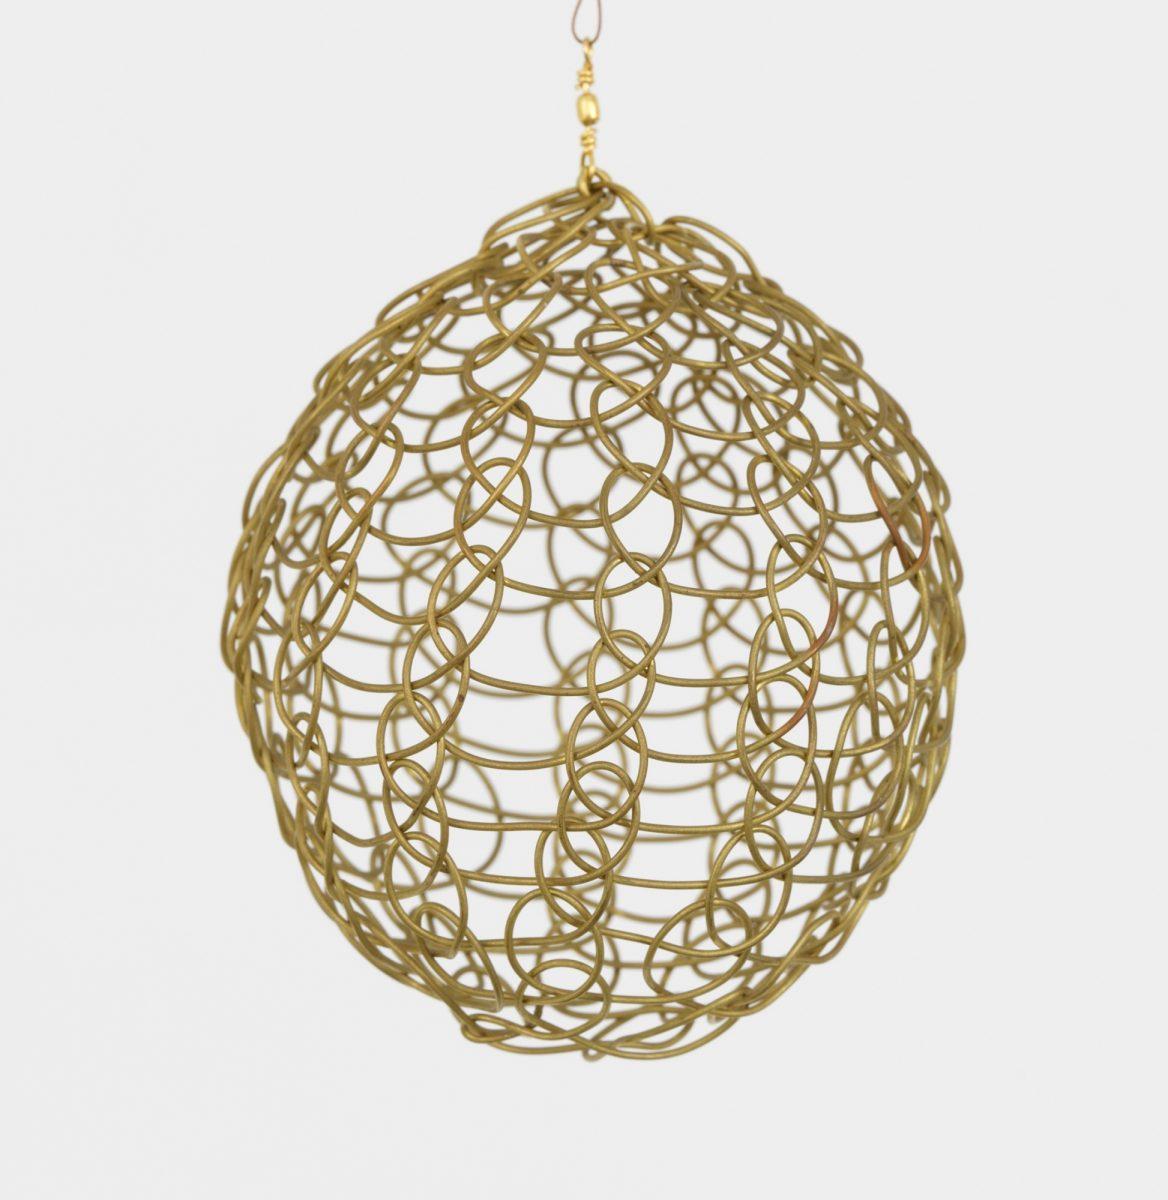 A17 40 Asawa S 788 Hanging Sphere